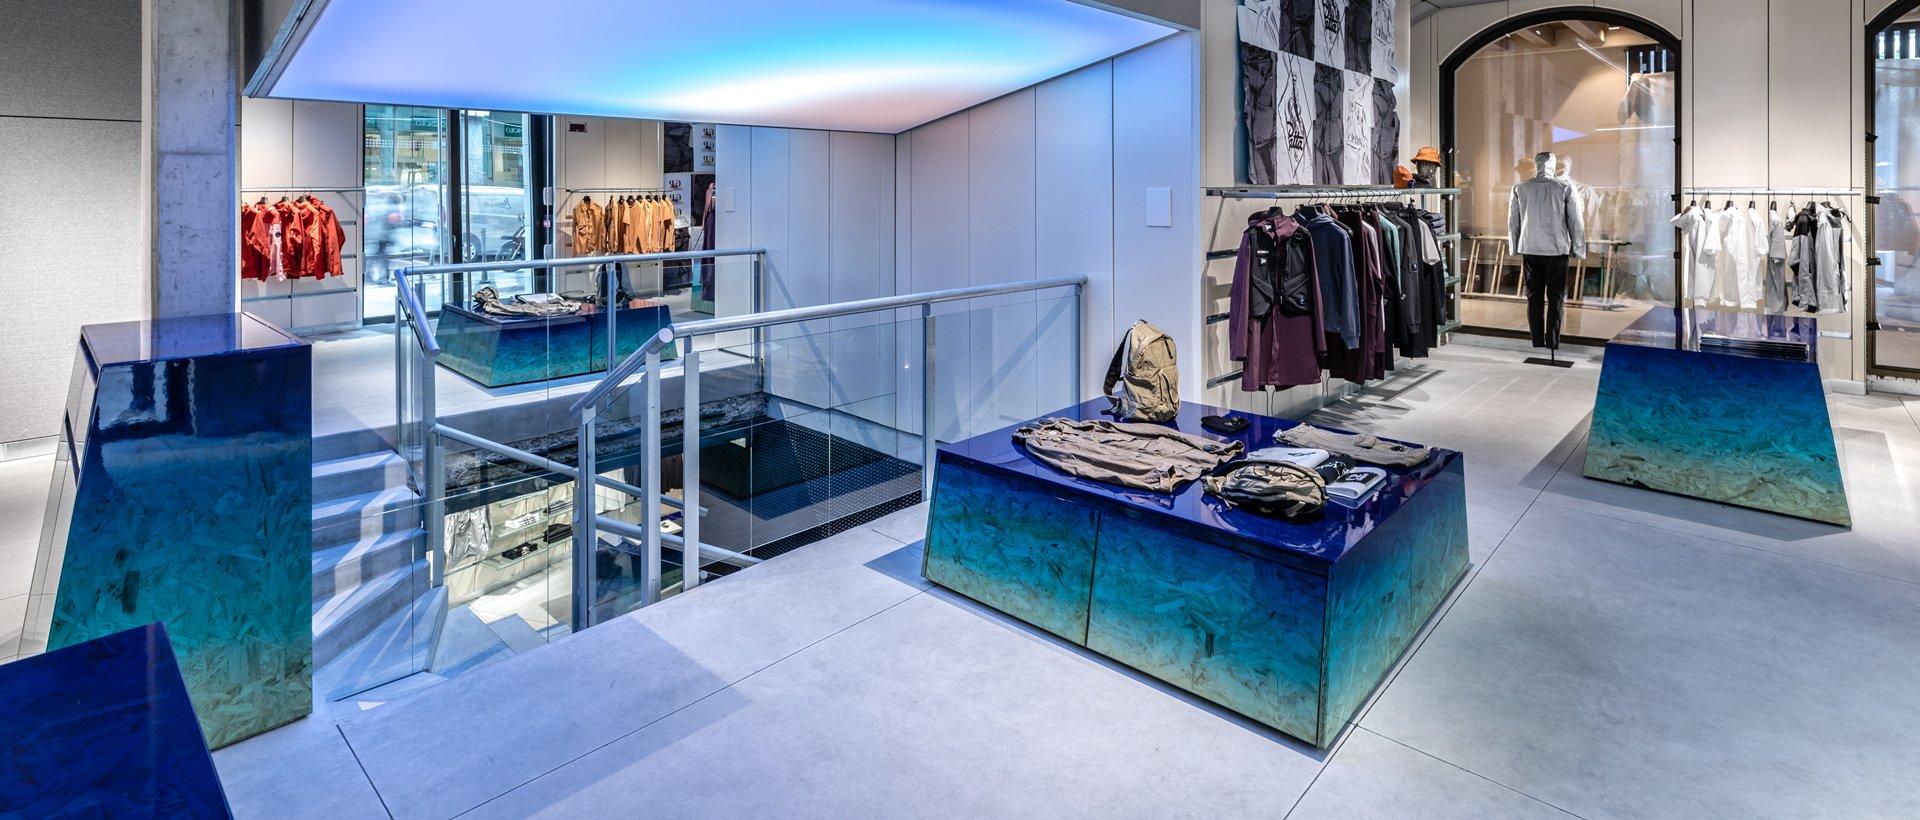 C.P. Company Store Milan